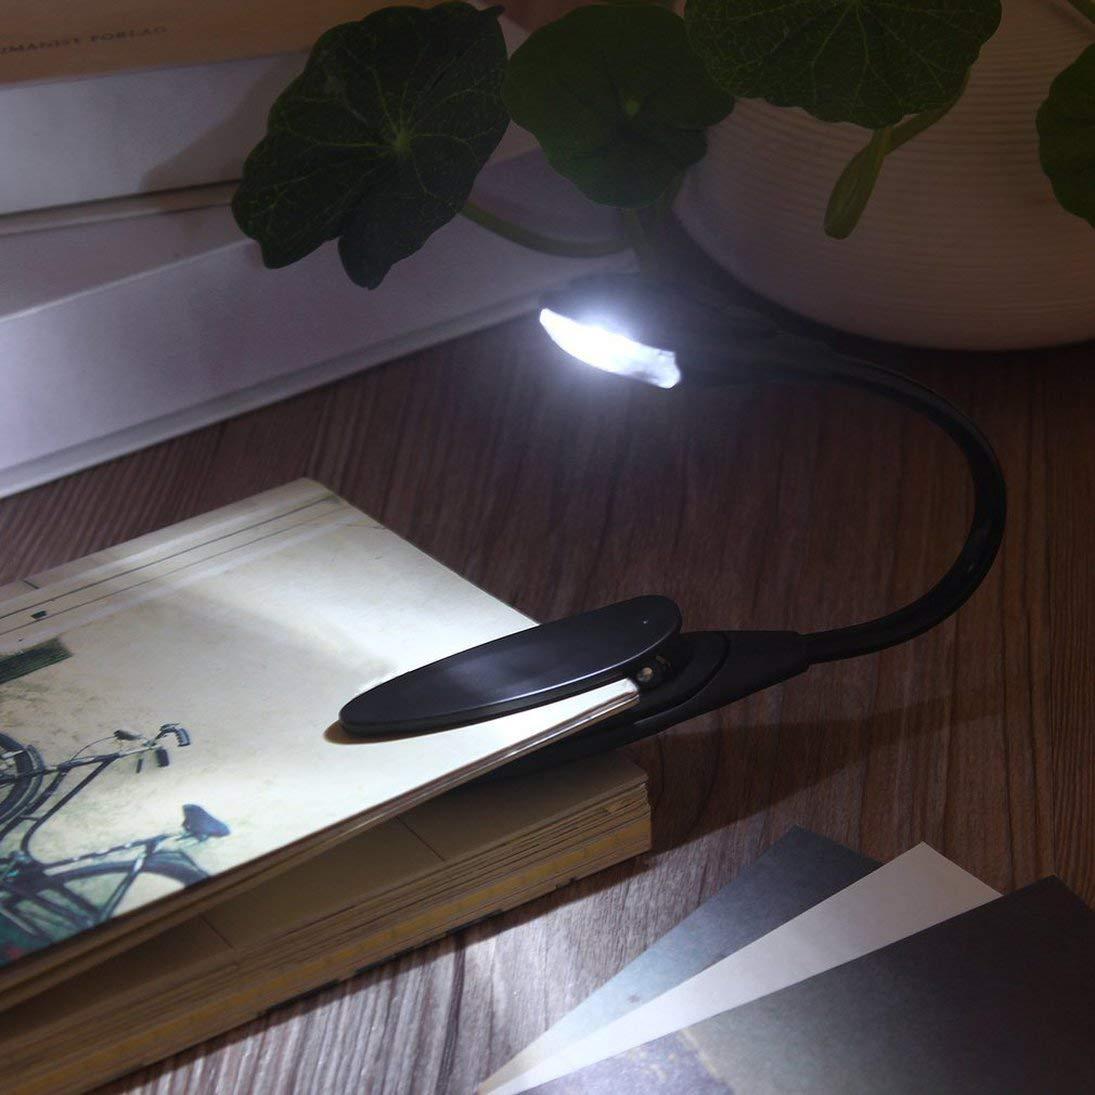 Mini Flexible Clip-On Brillante Libro Luz port/átil Blanco LED L/ámpara de Lectura de Lectura de Libro L/ámpara port/átil compacta de Dormitorio estudiantil Luces ToGames-ES